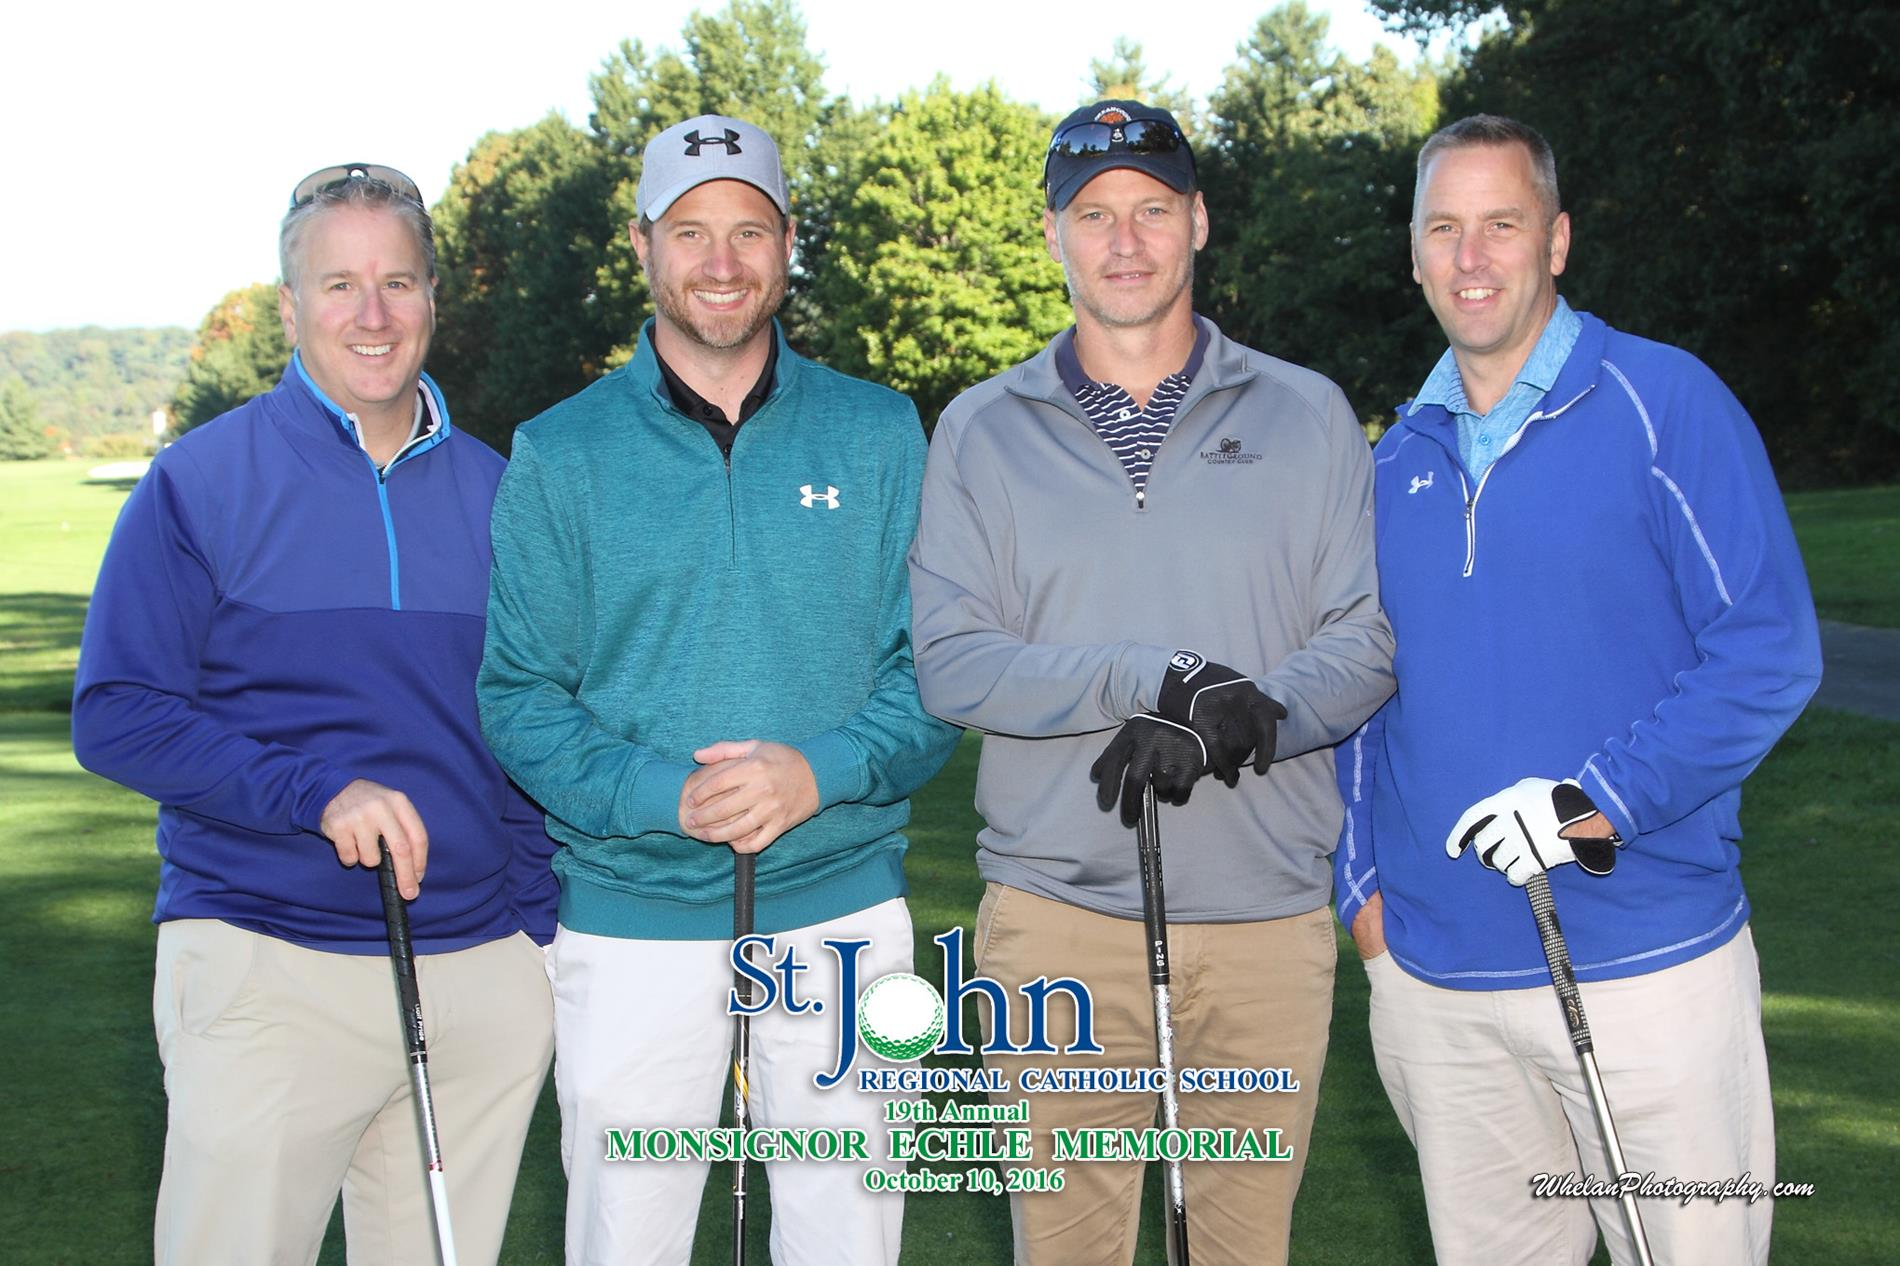 Monsignor Echle Memorial golf tournament more golfers